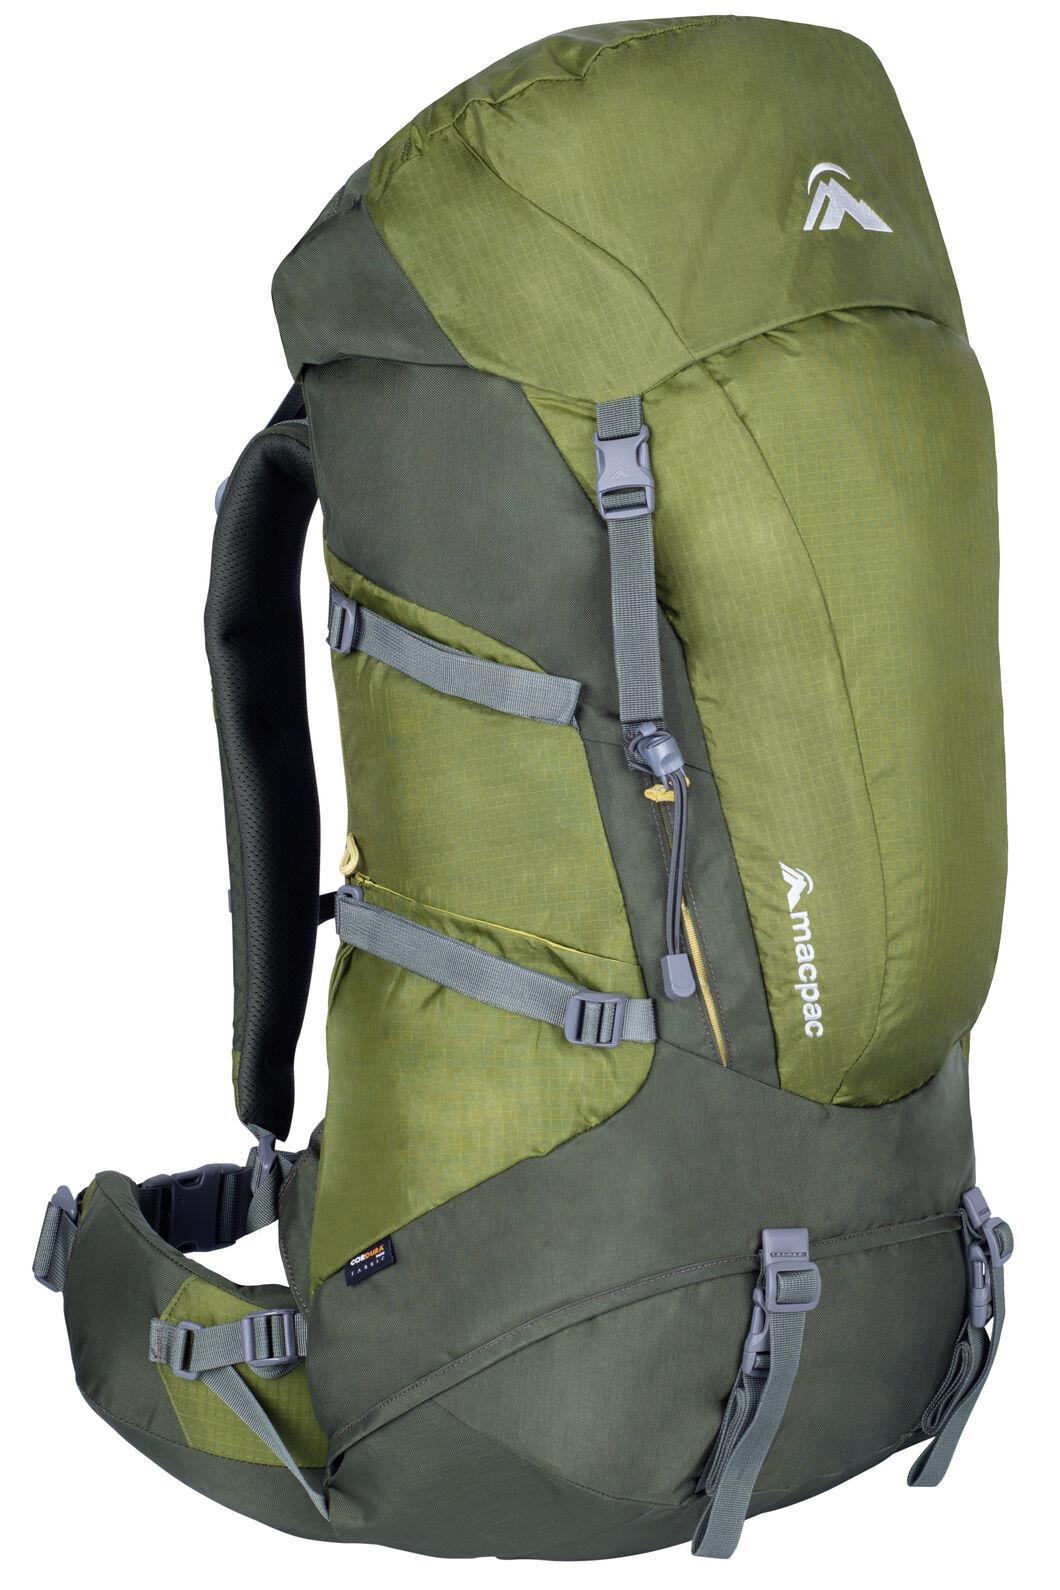 Macpac Torlesse 65L Pack, Calla Green/Forest, hi-res